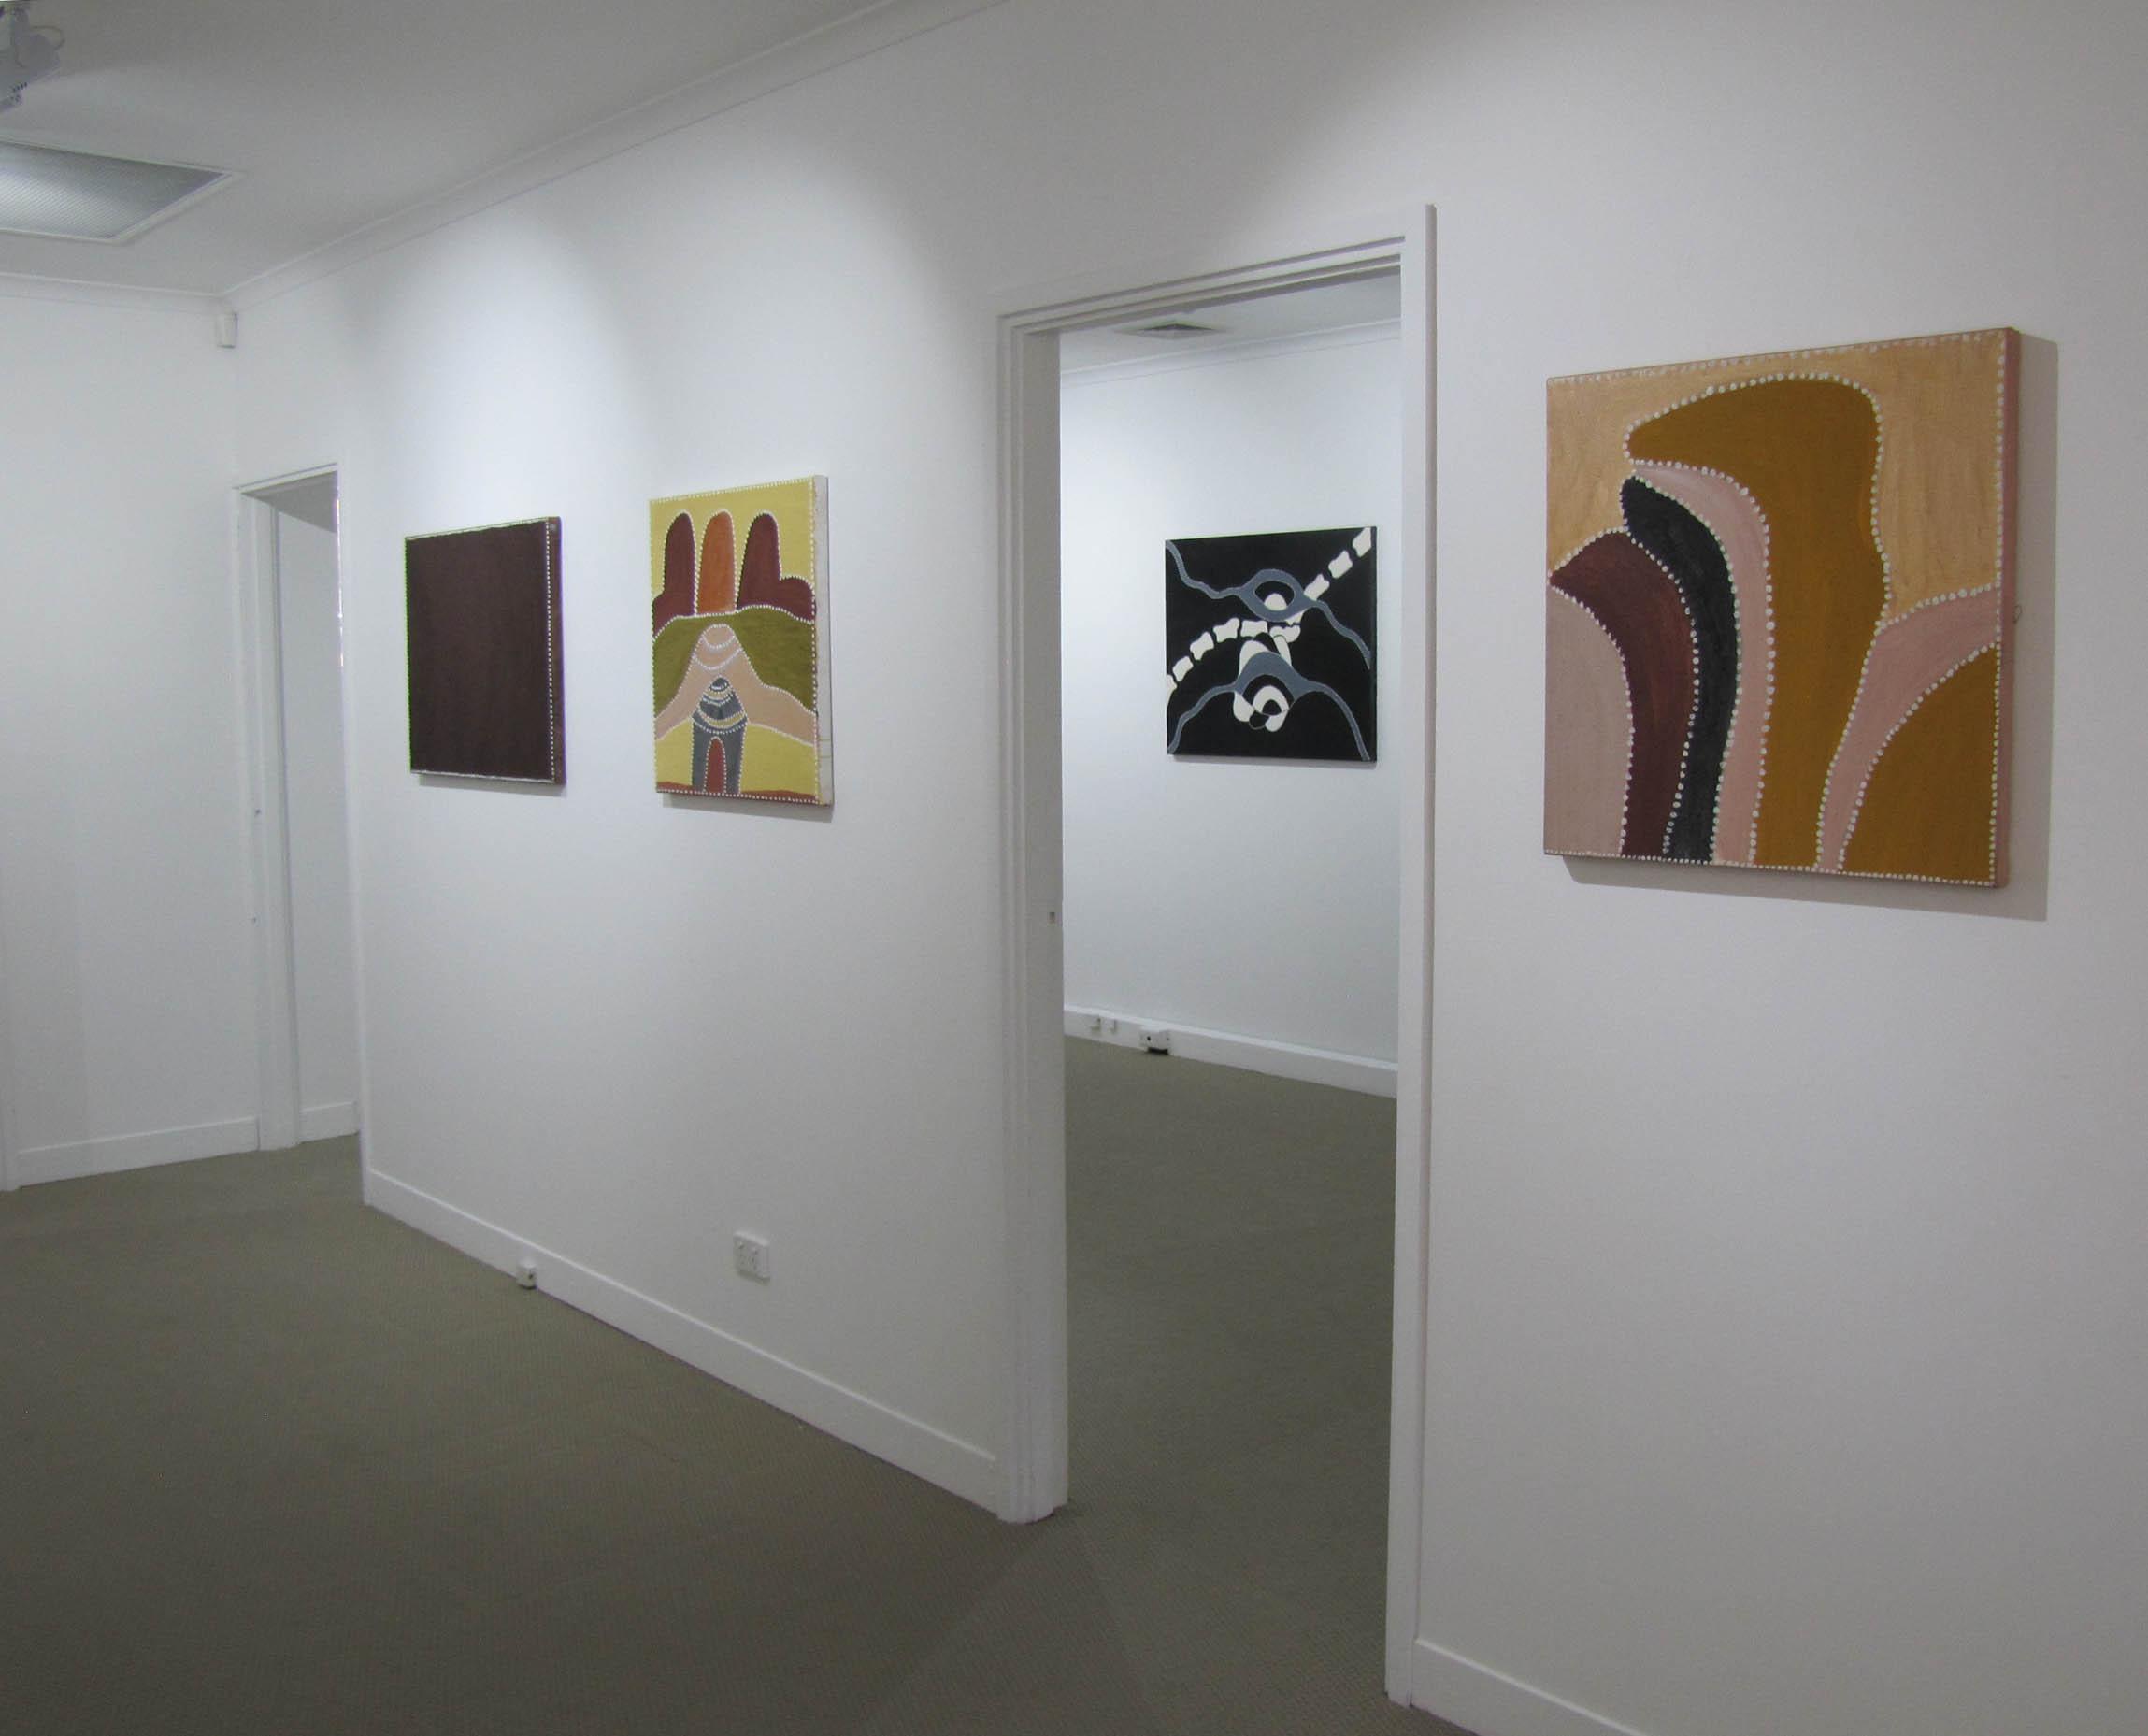 NSG. Warmun 4 exhibition. Exhibition views 7.jpg